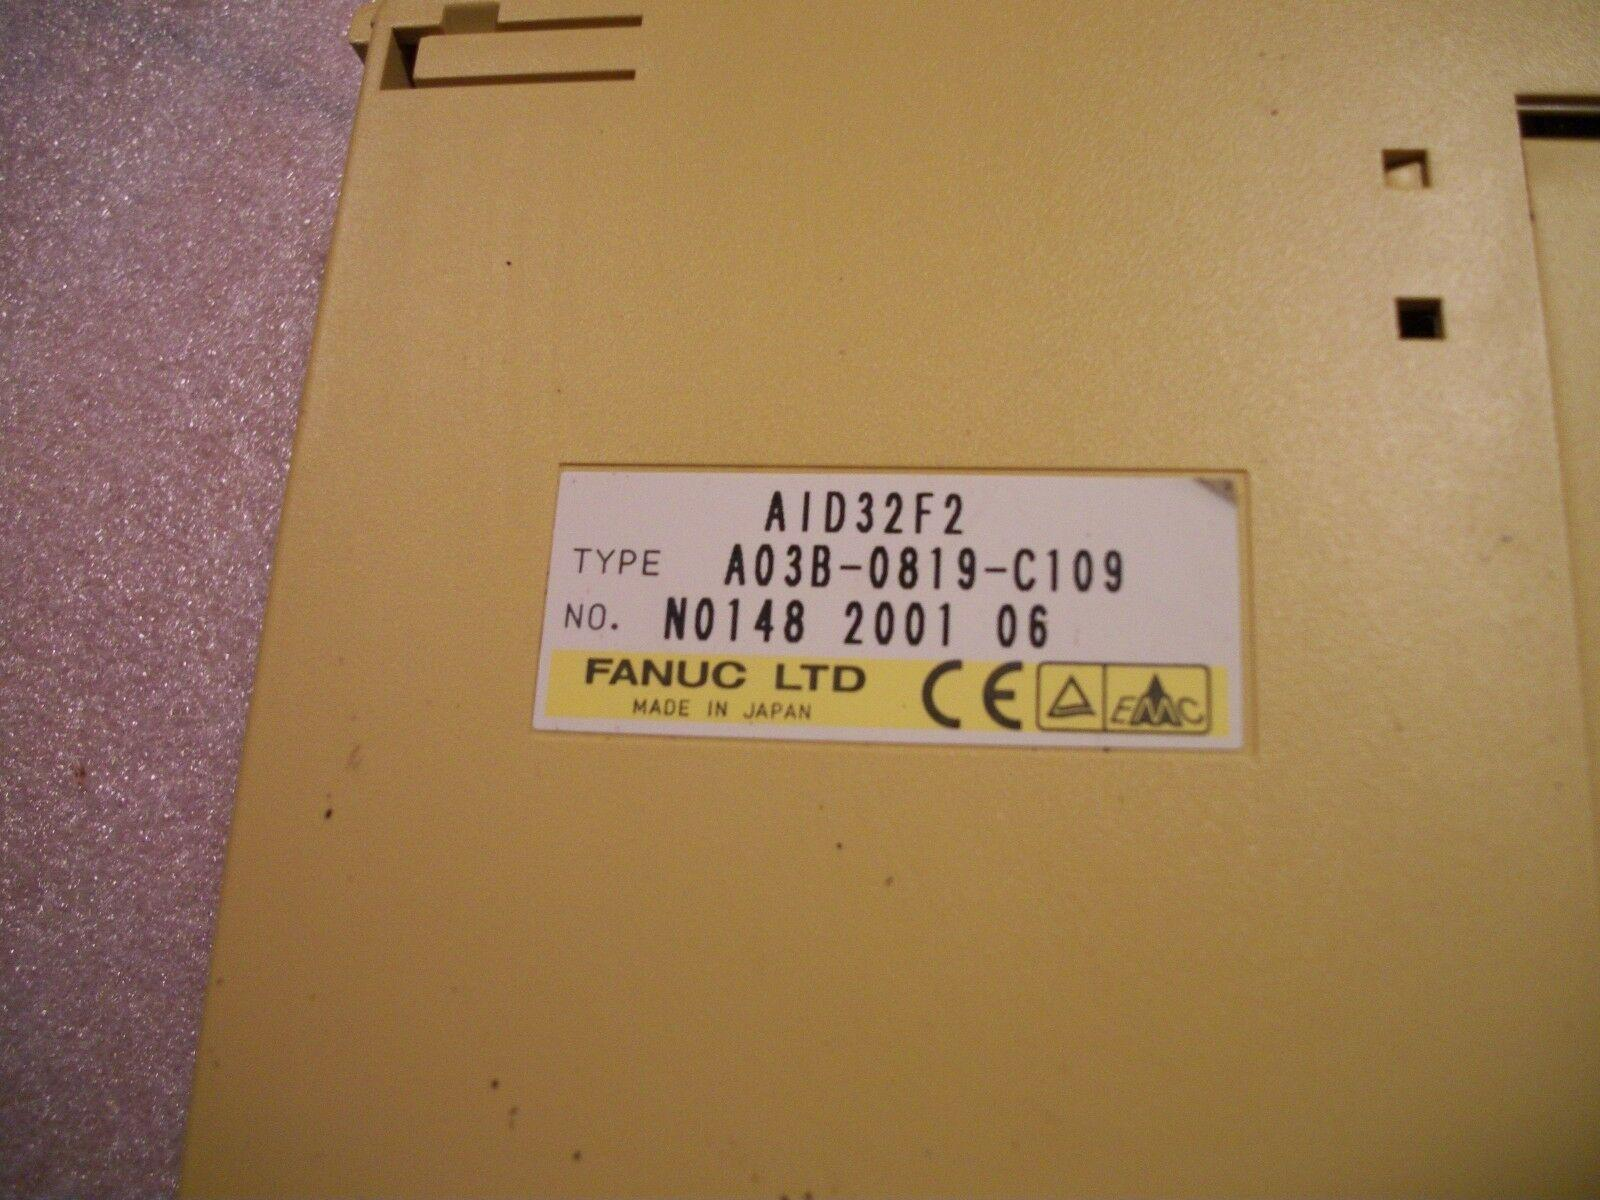 Fanuc IO Module AID32F2 A03B-0819-C109